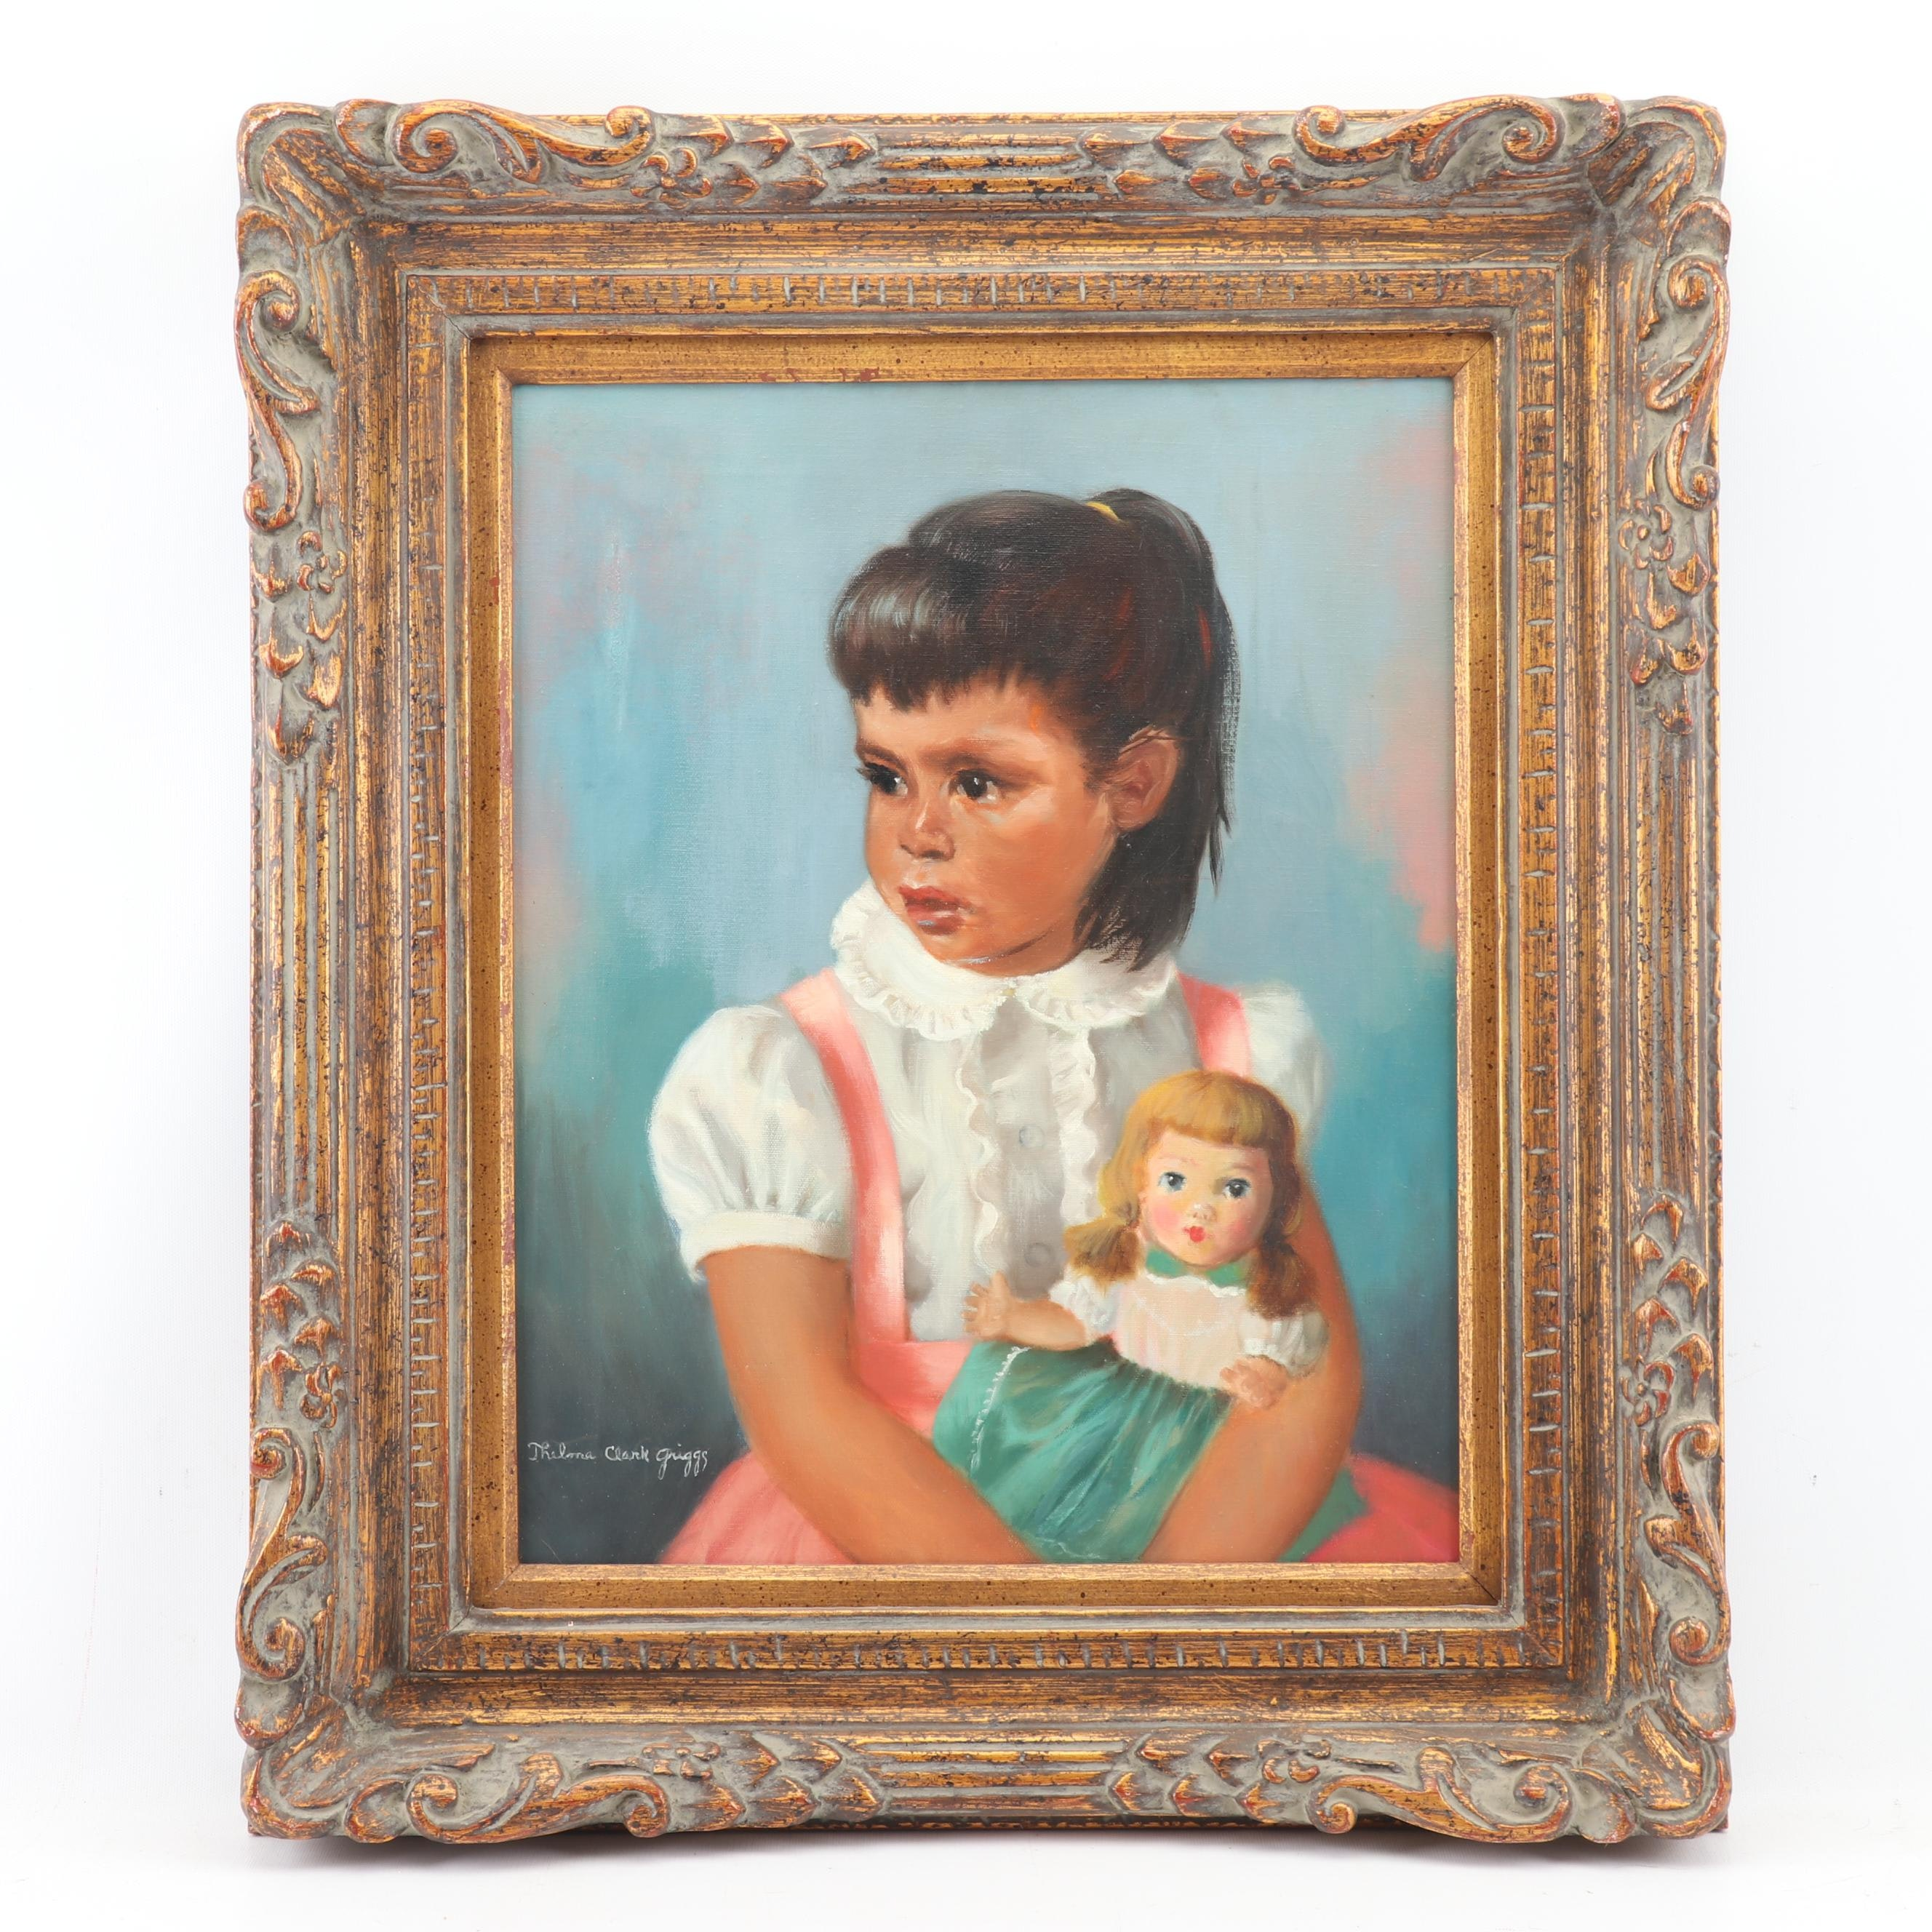 Thelma Clark Griggs Portrait Oil Painting